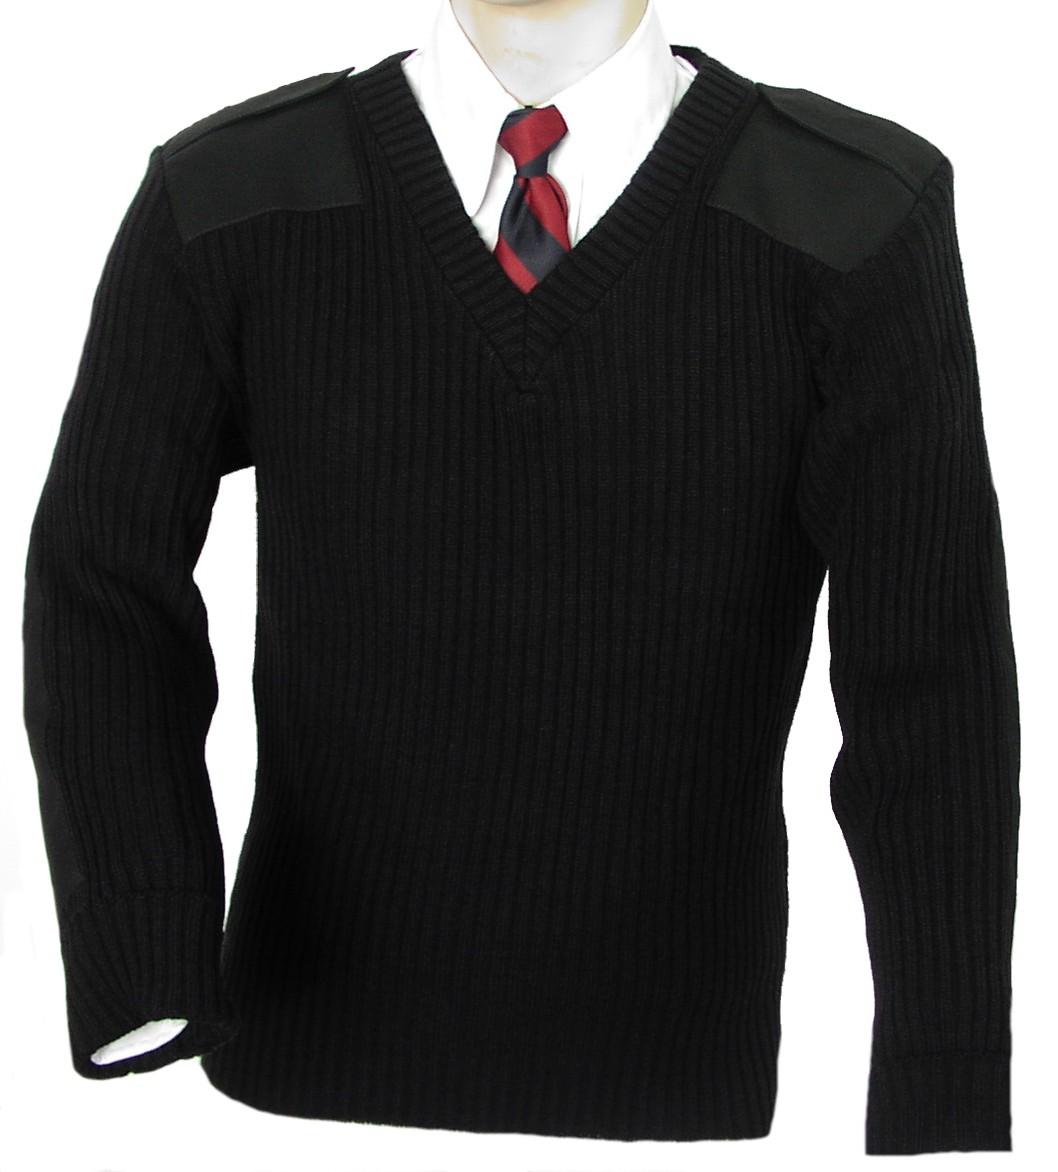 Custom high quality knitting security uniform woolen unisex police uniform